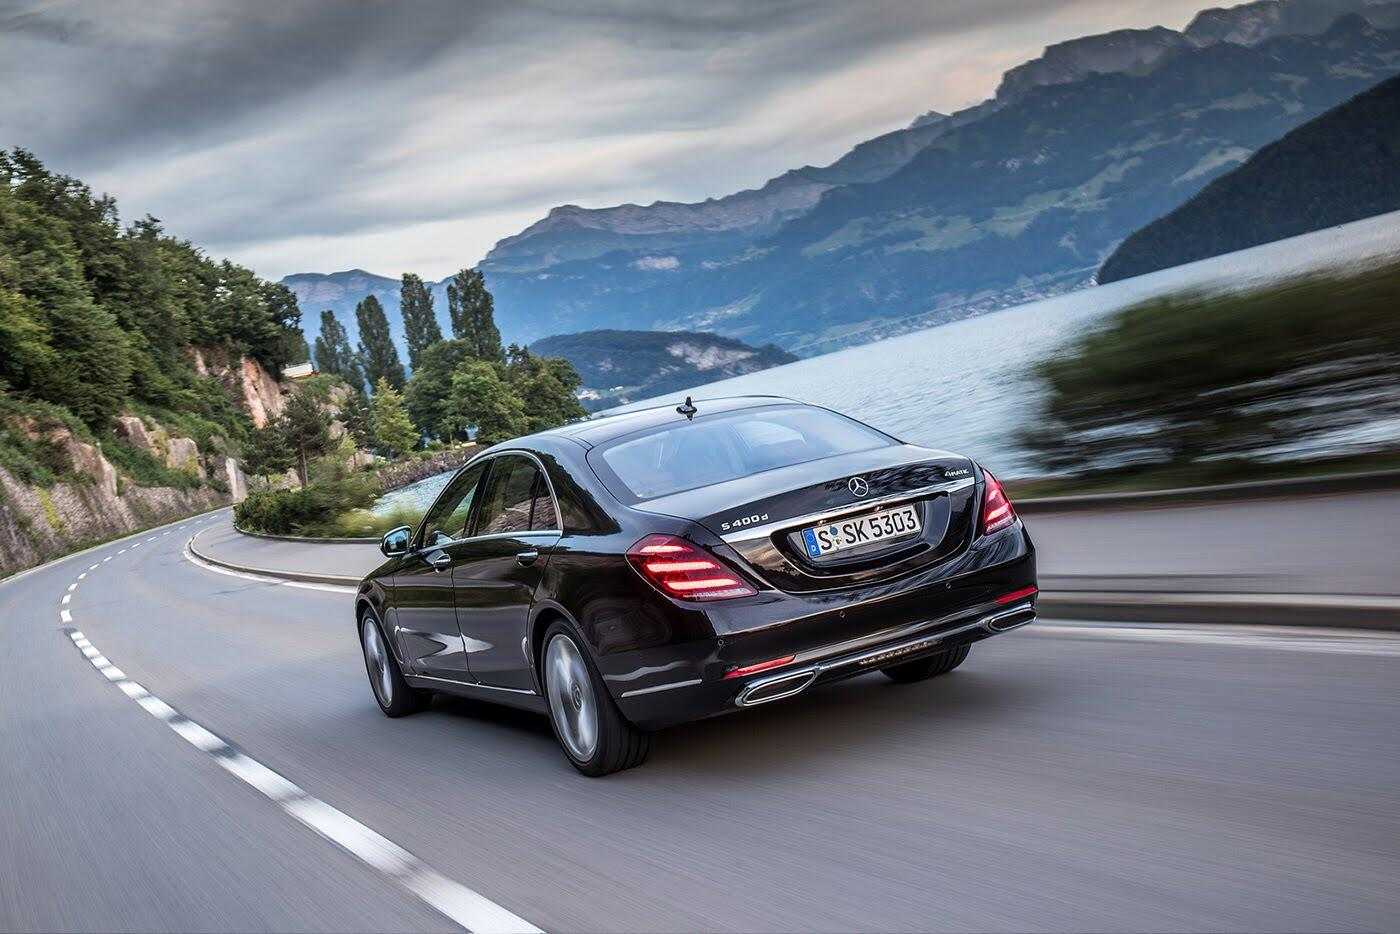 Ảnh chi tiết Mercedes-Benz S-Class 2018 - Hình 19